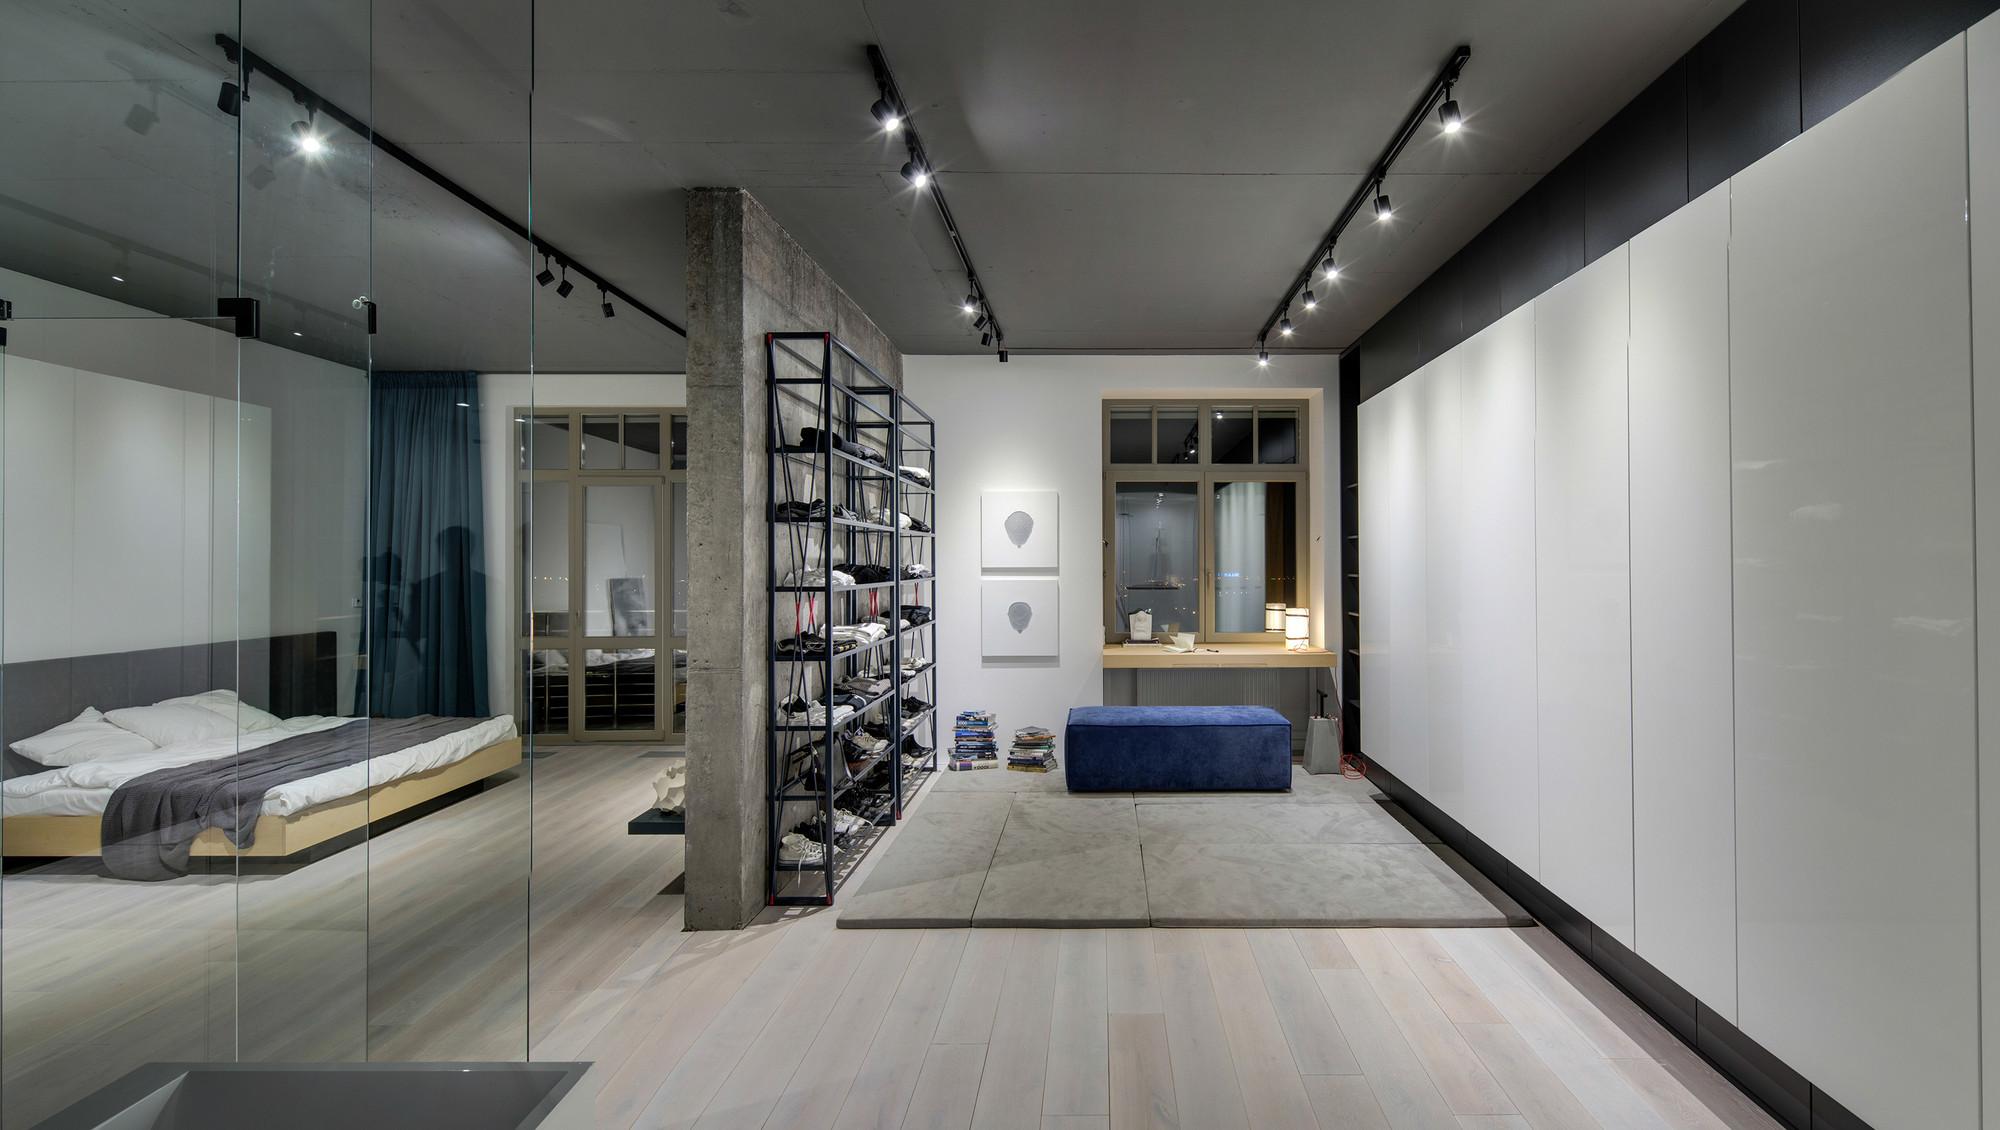 Gallery of 32nd apartment 17 - Loft industriel martin architectes kiev ...